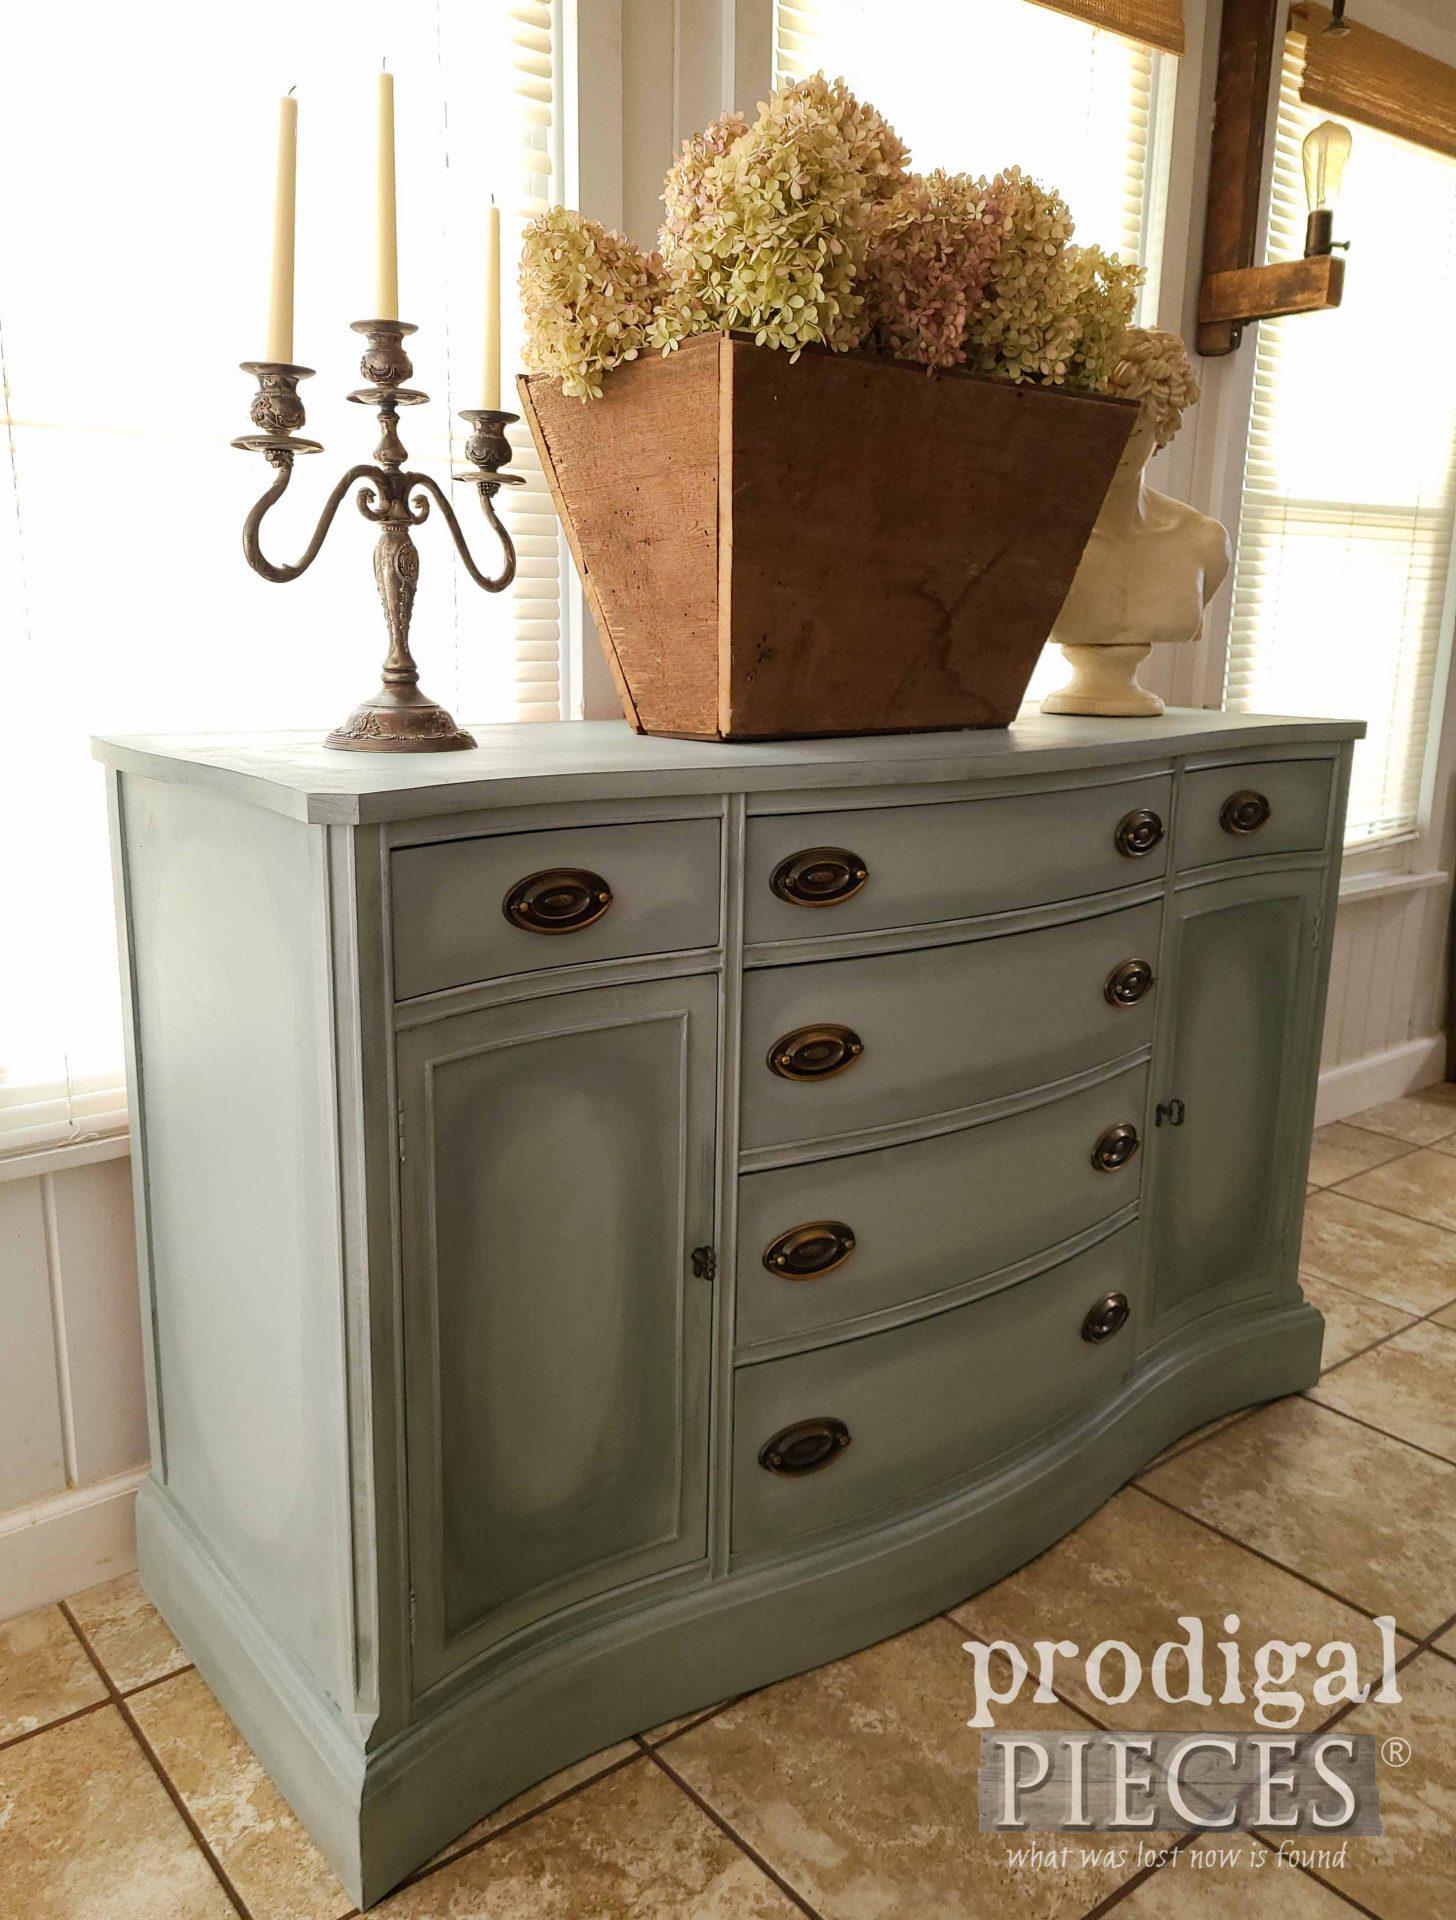 Left Side of Vintage Bassett Buffet by Larissa of Prodigal Pieces | prodigalpieces.com #prodigalpieces #furniture #diy #home #homedecor